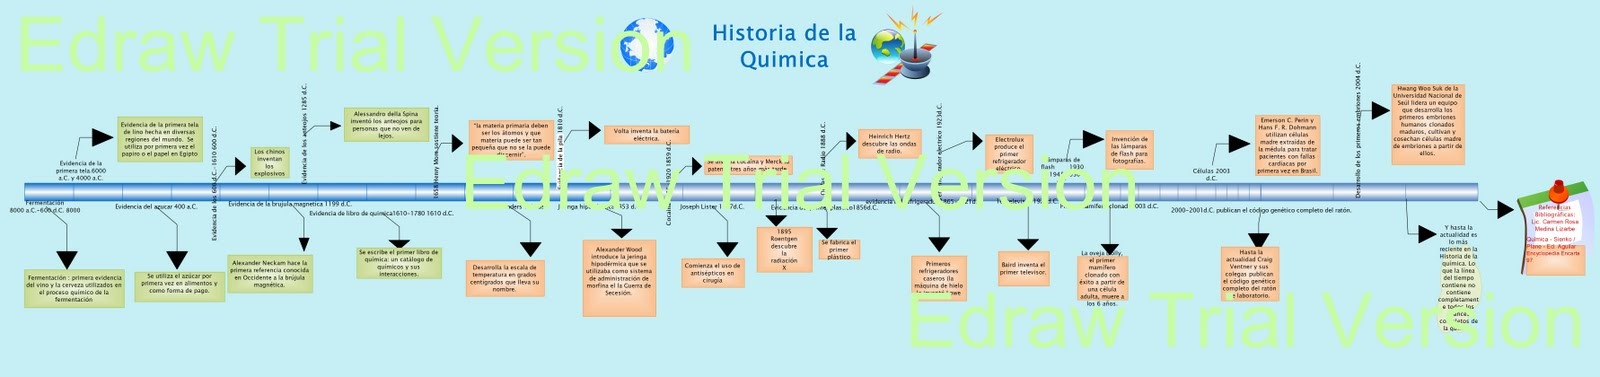 Evolucion de la Quimica Linea Del Tiempo Linea Del Tiempo de la Quimica